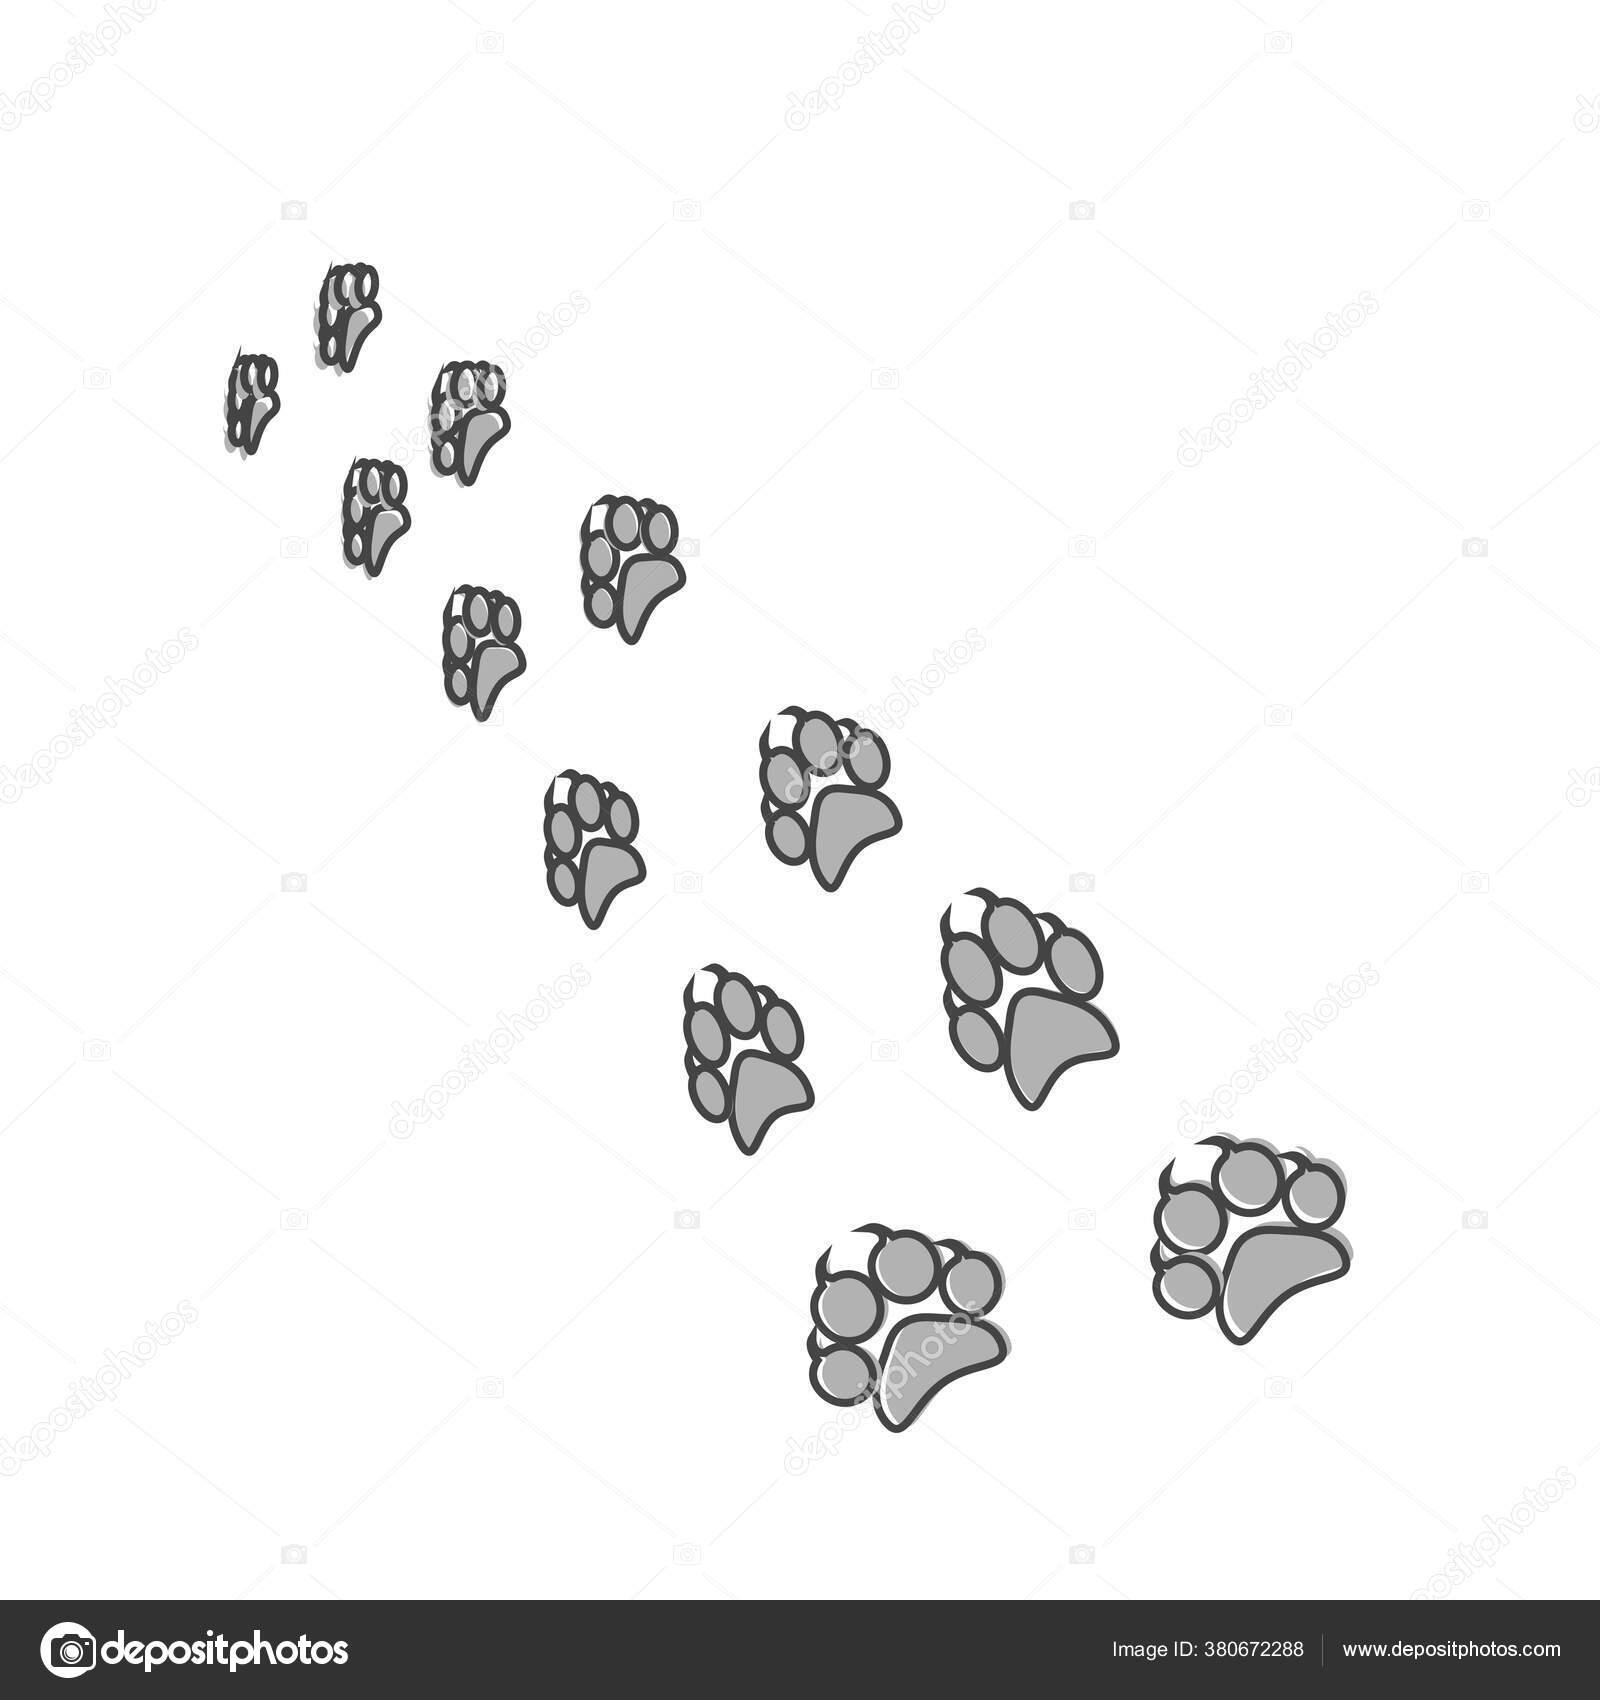 Ikon Vektor Jejak Kaki Hewan Gaya Gambar Cakar Kartun Pada Stok Vektor C Oksanaoo 380672288